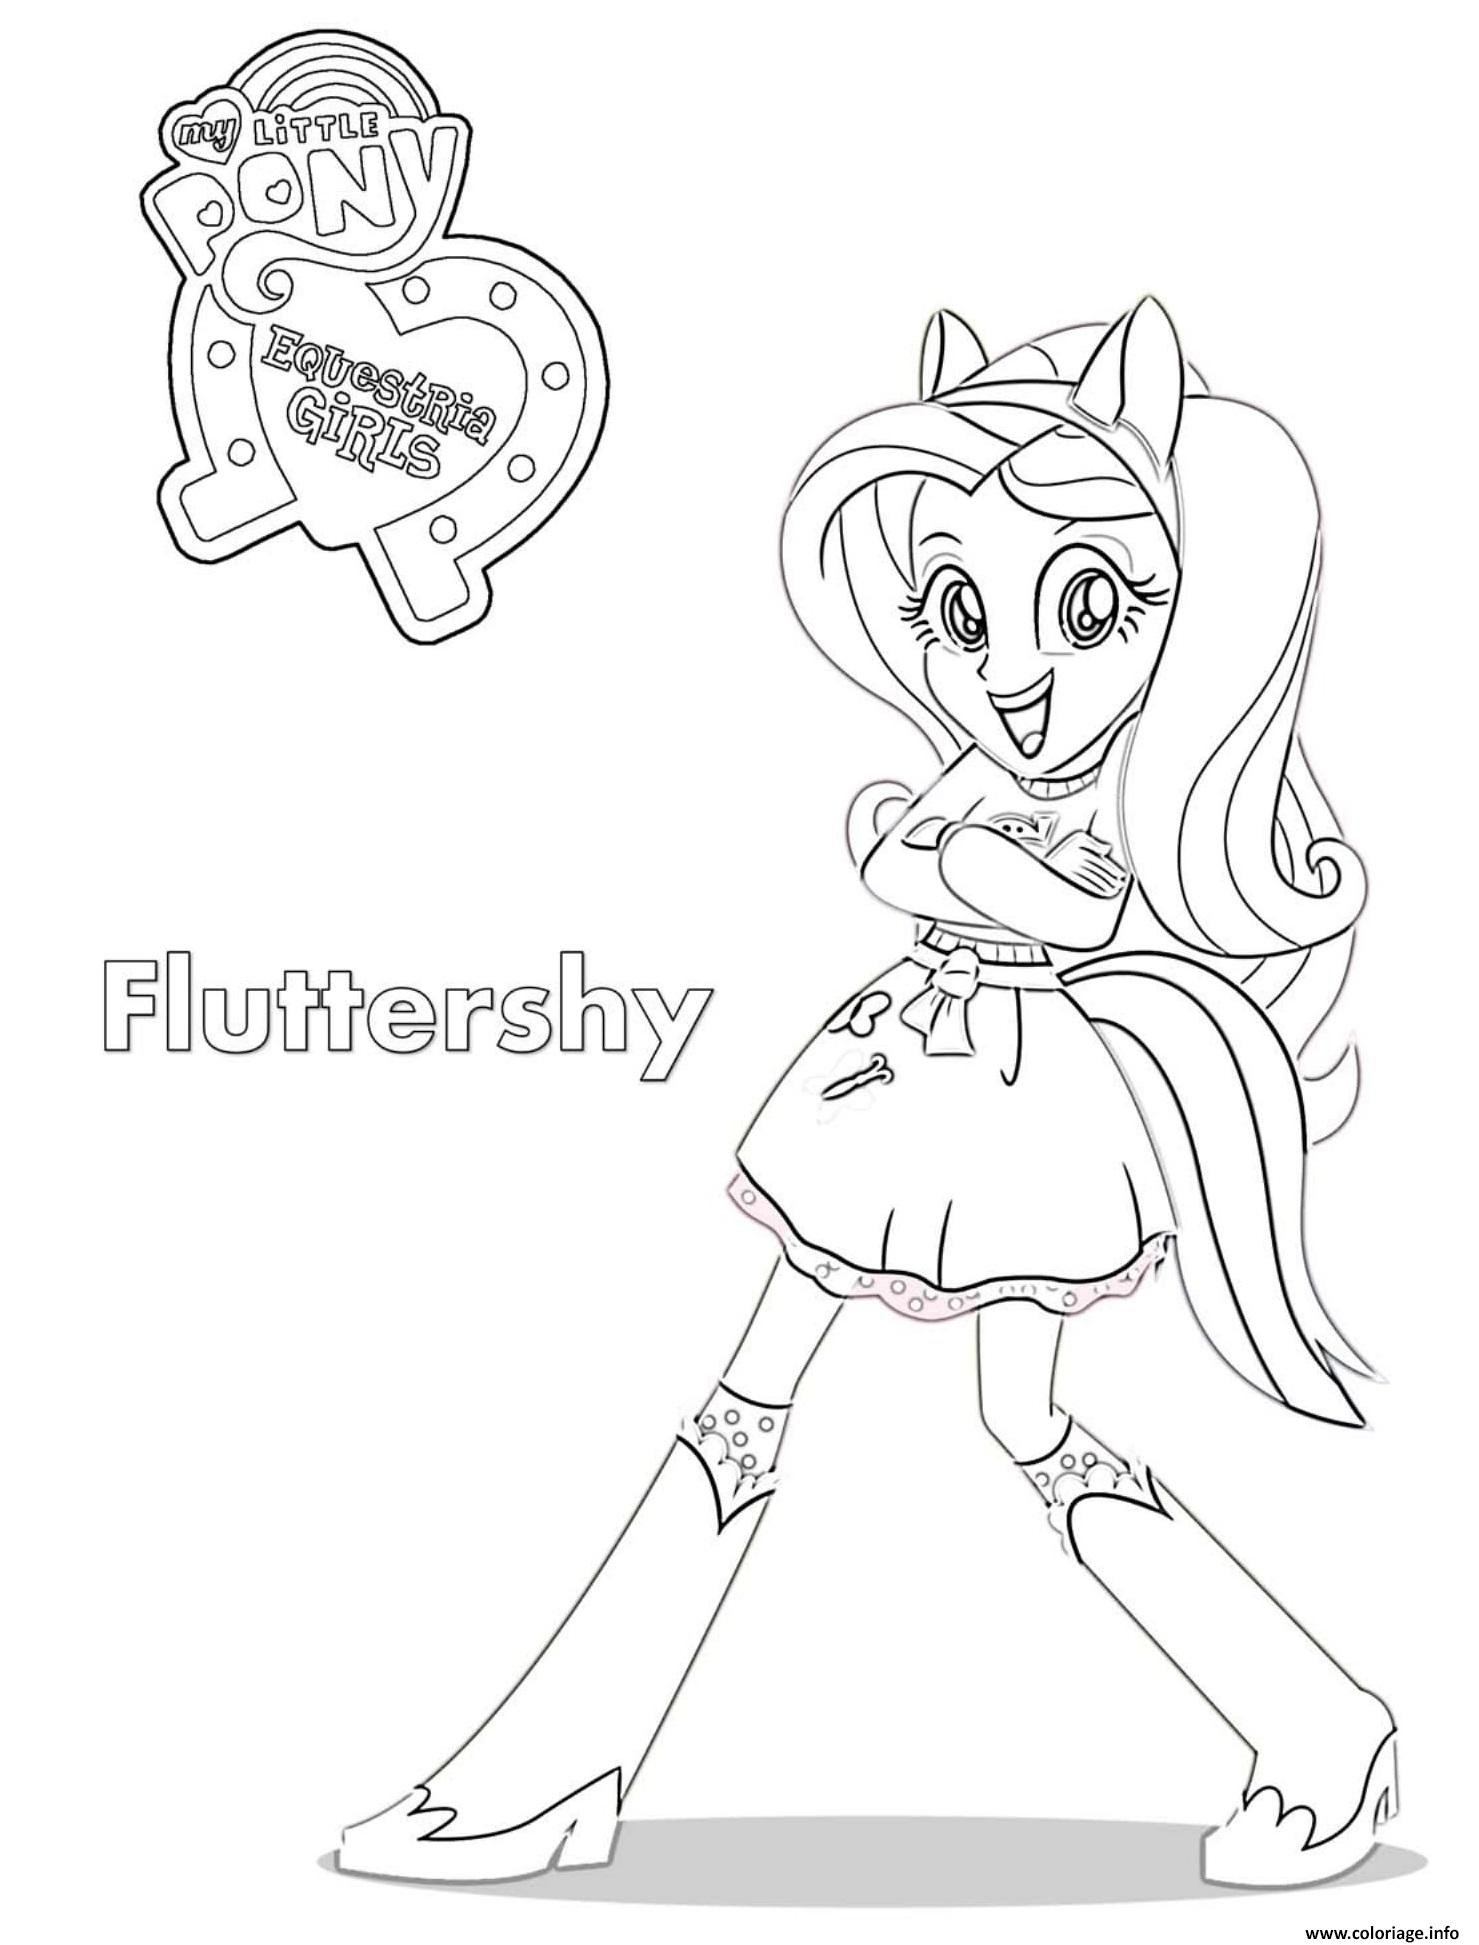 Coloriage equestria girls fluttershy - Coloriage equestria girl a imprimer ...